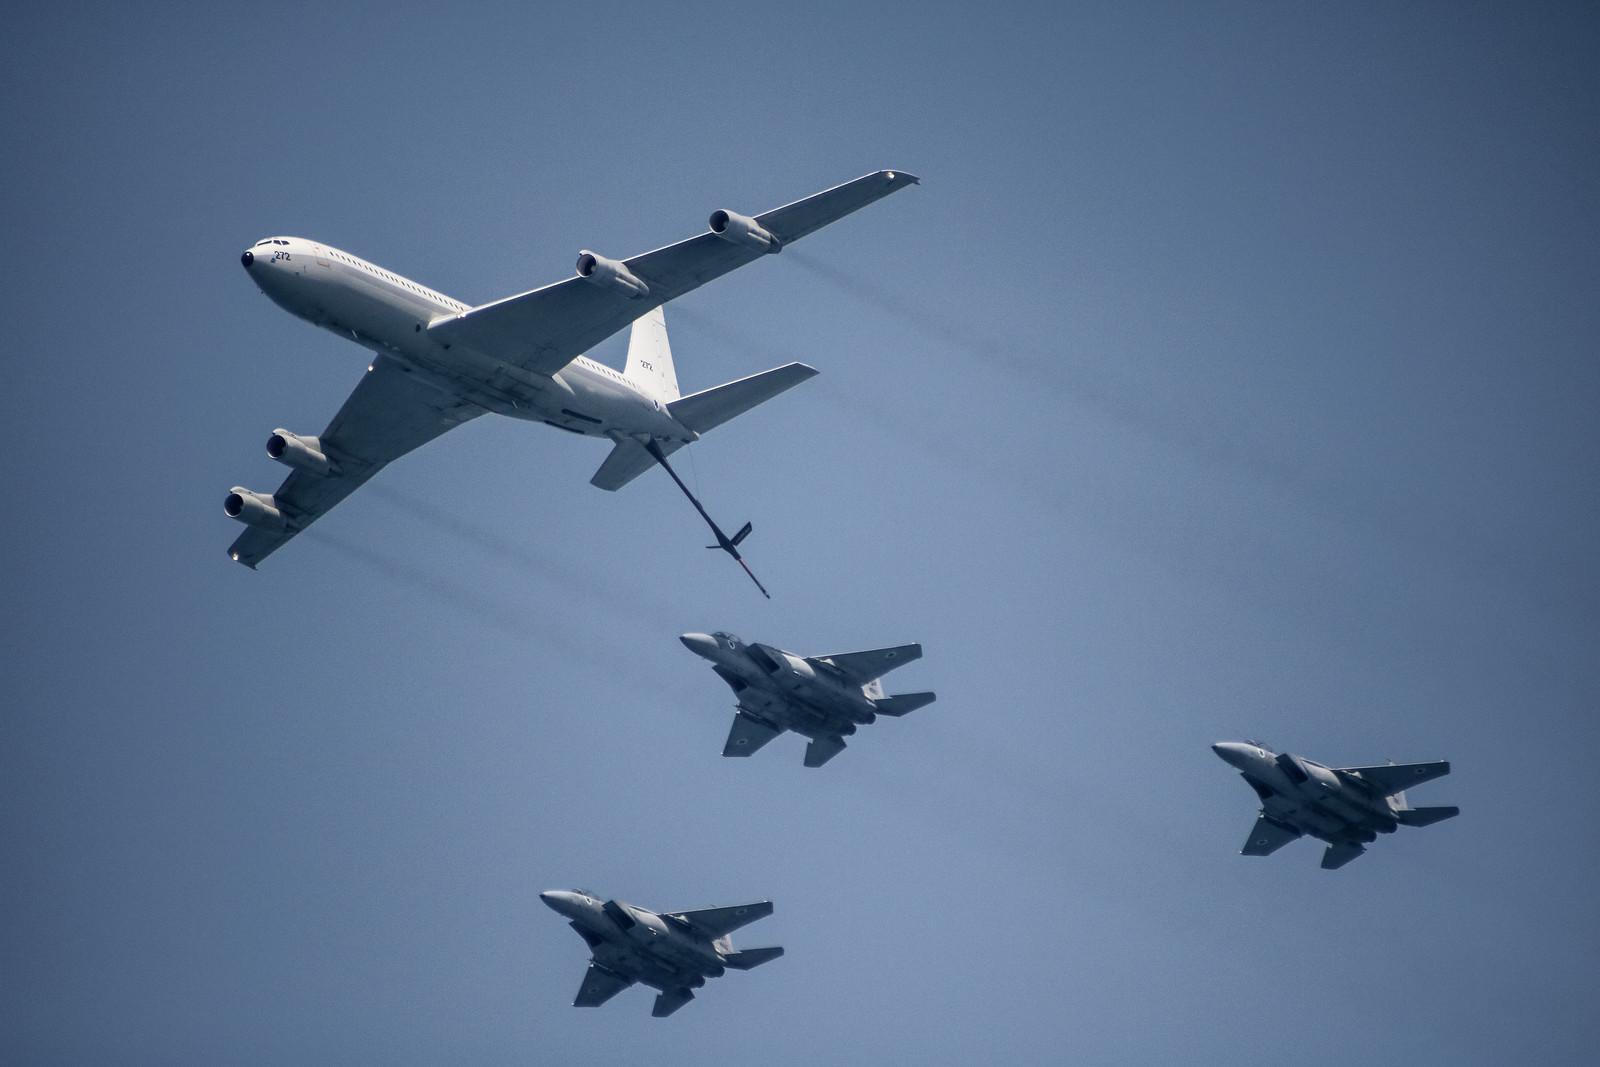 AerospaceDefenseIndustry.com (Aerospace Defense Industry), domain name for sale